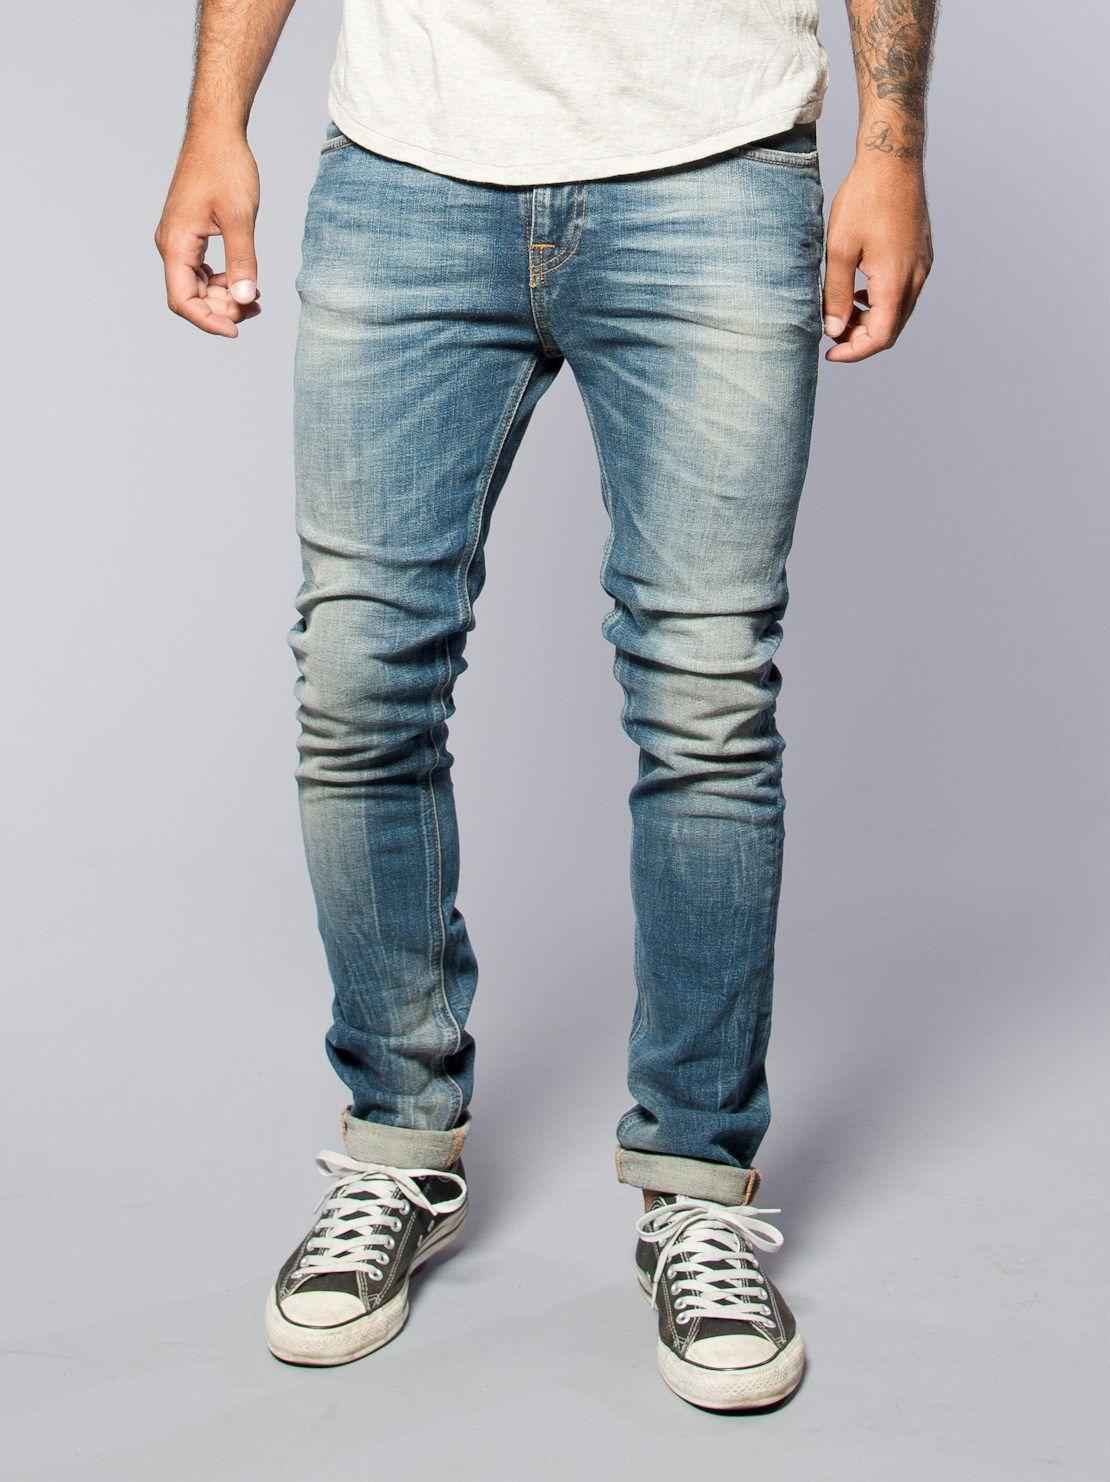 High Kai Organic Greystone - Nudie Jeans Co Online Shop